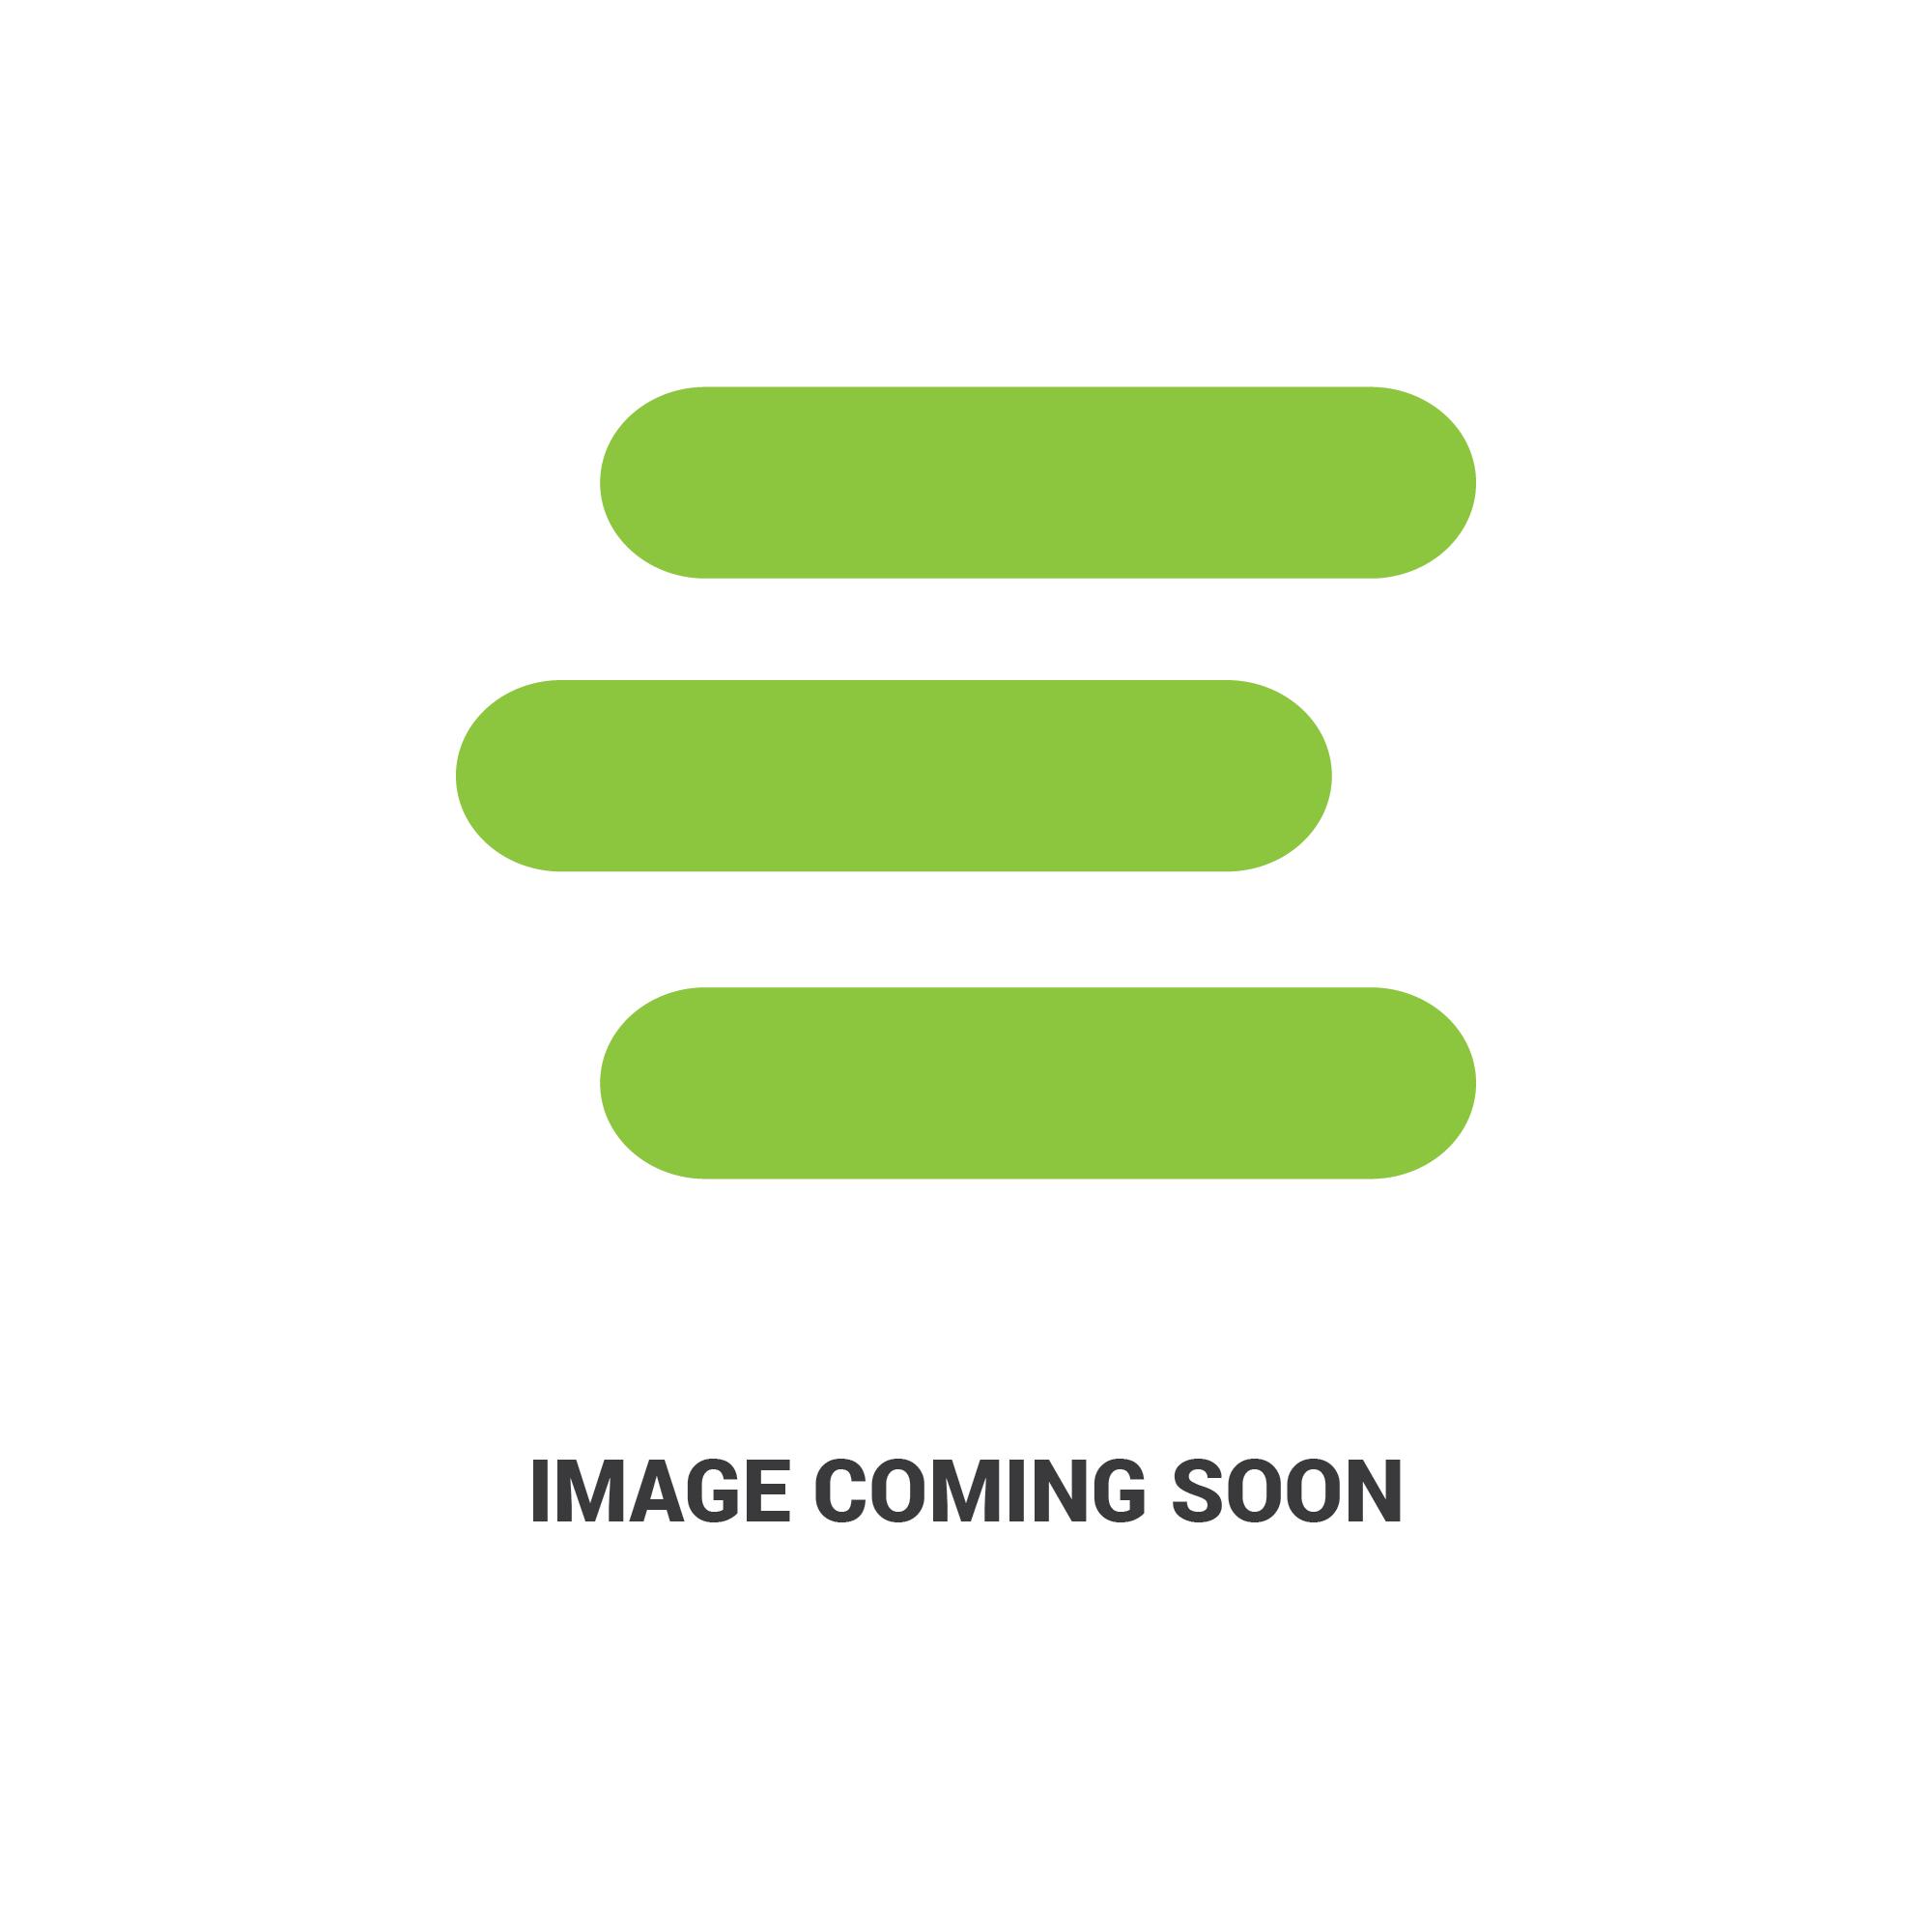 E-7010163edit 1.jpg